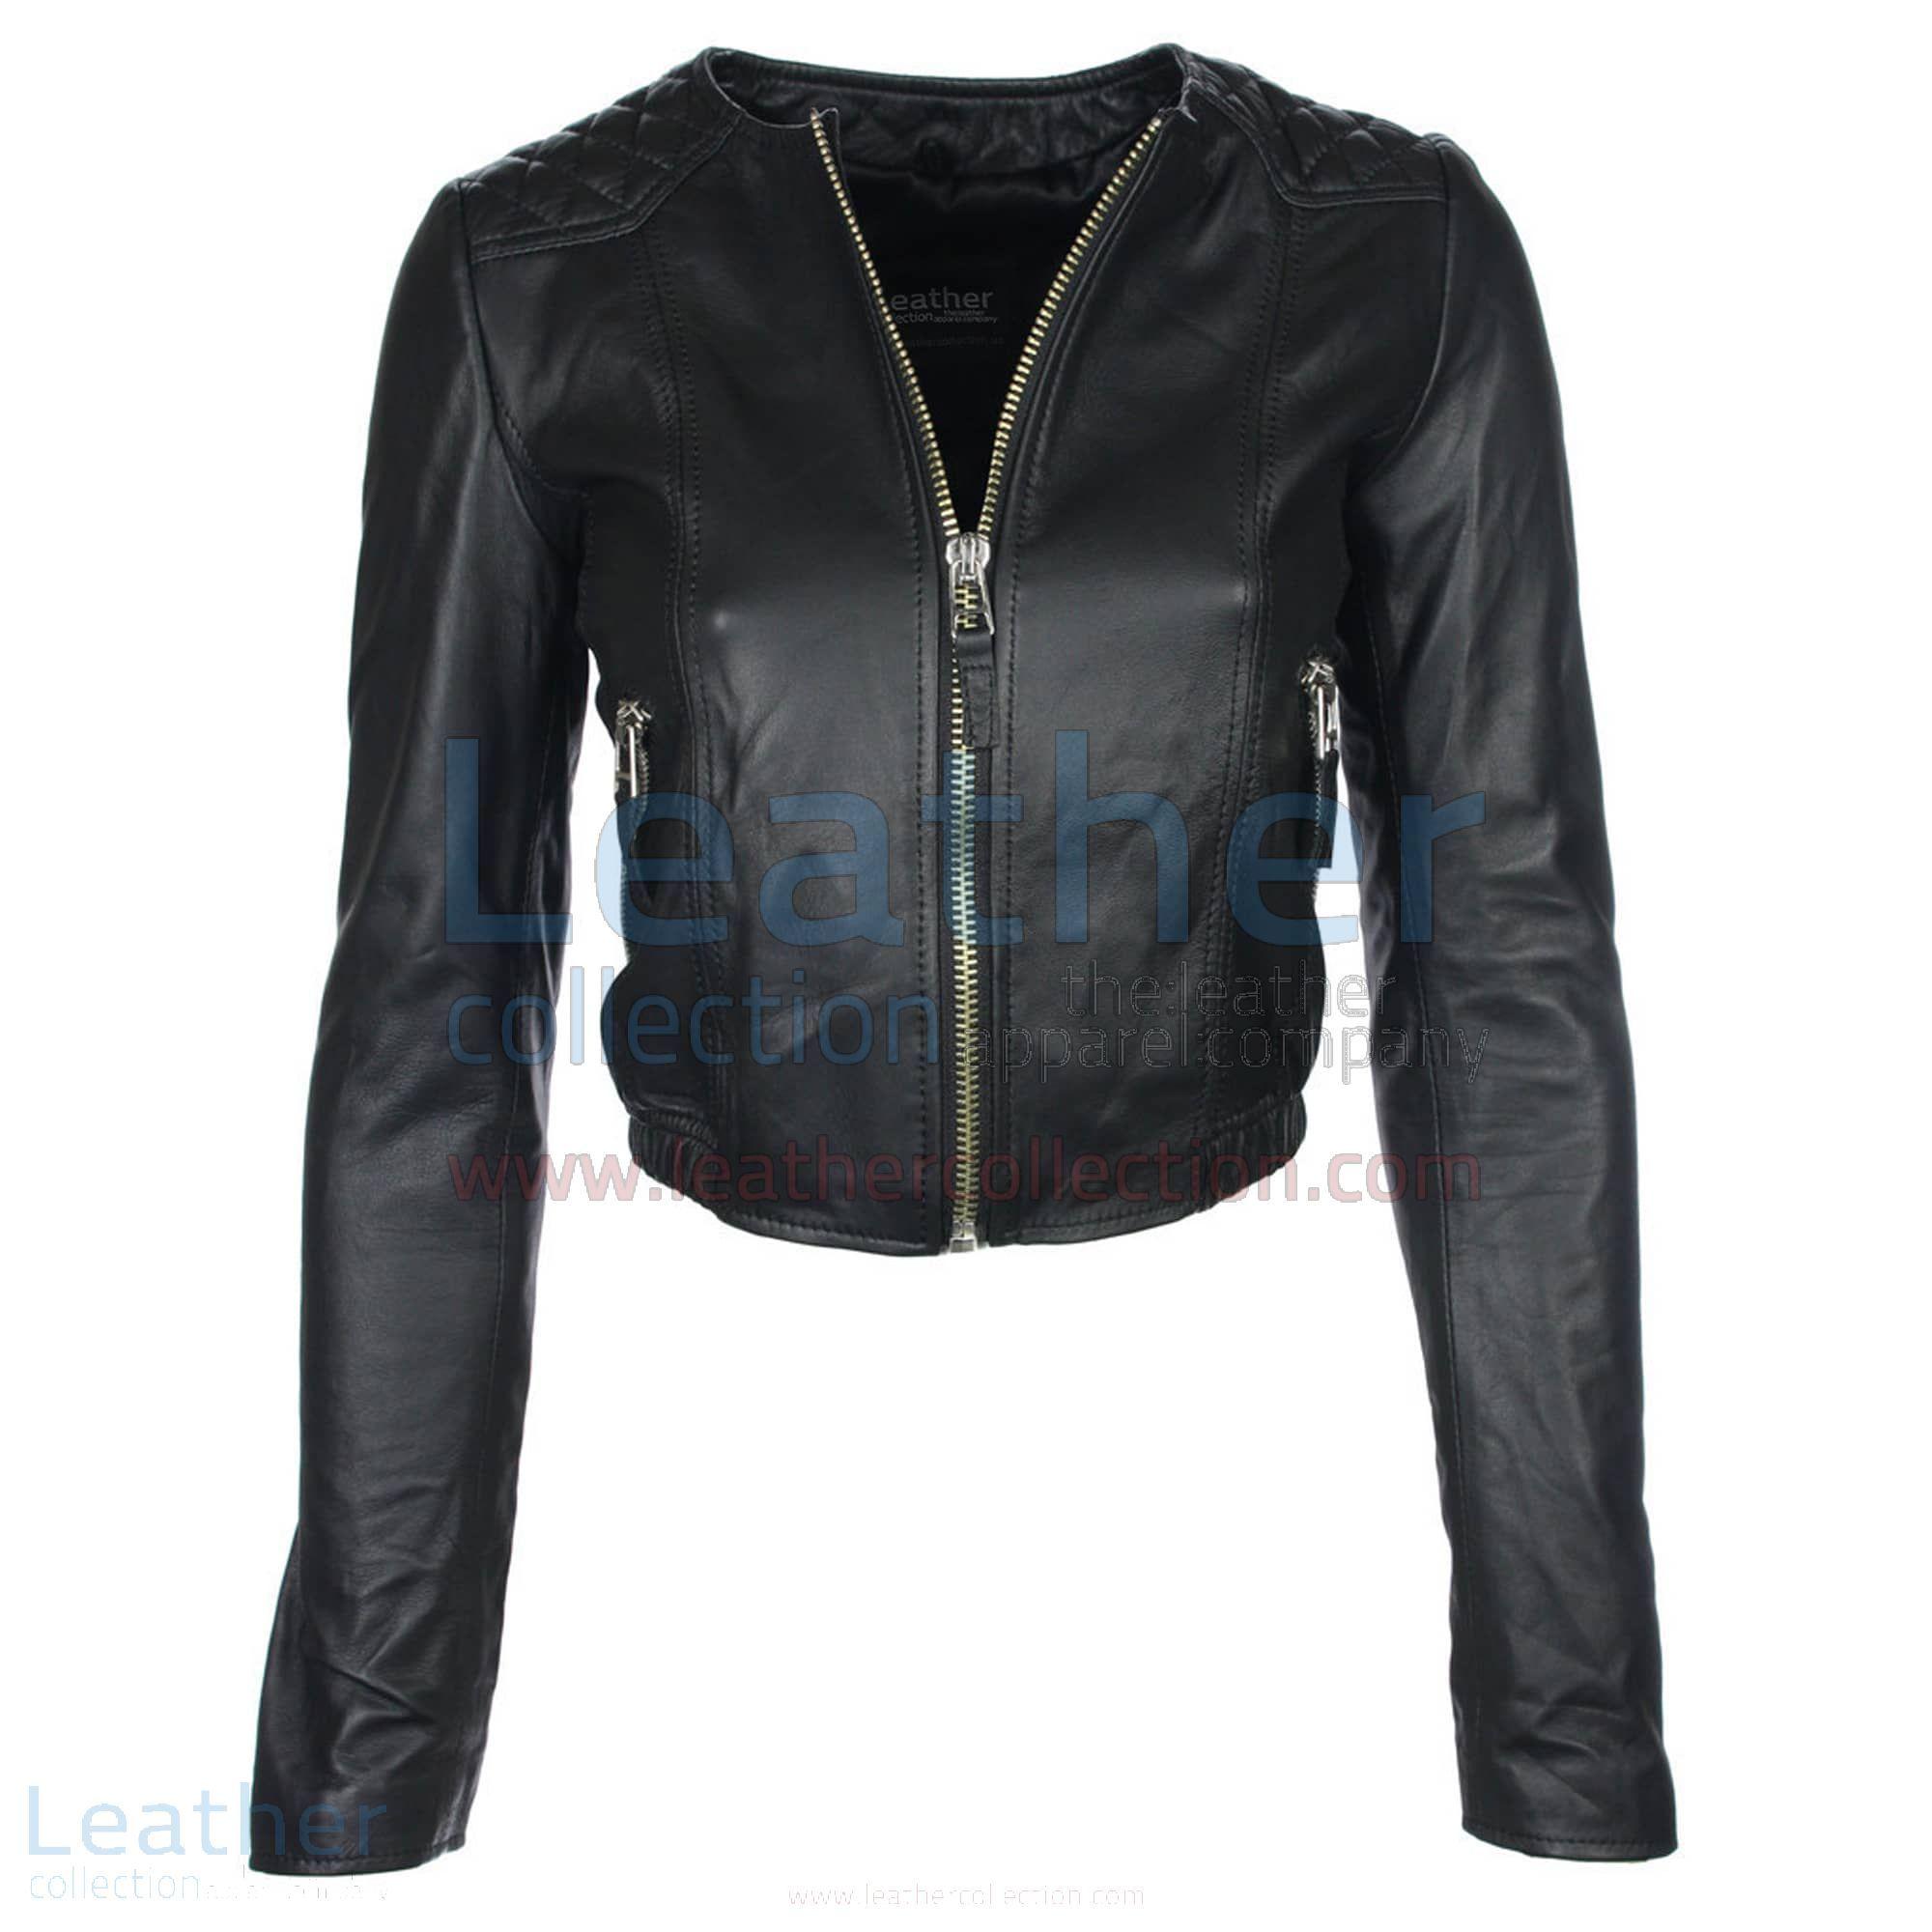 Collarless Leather Jacket Collarless Leather Jacket Womens Leather Biker Jacket Leather Jackets Women [ 2000 x 2000 Pixel ]